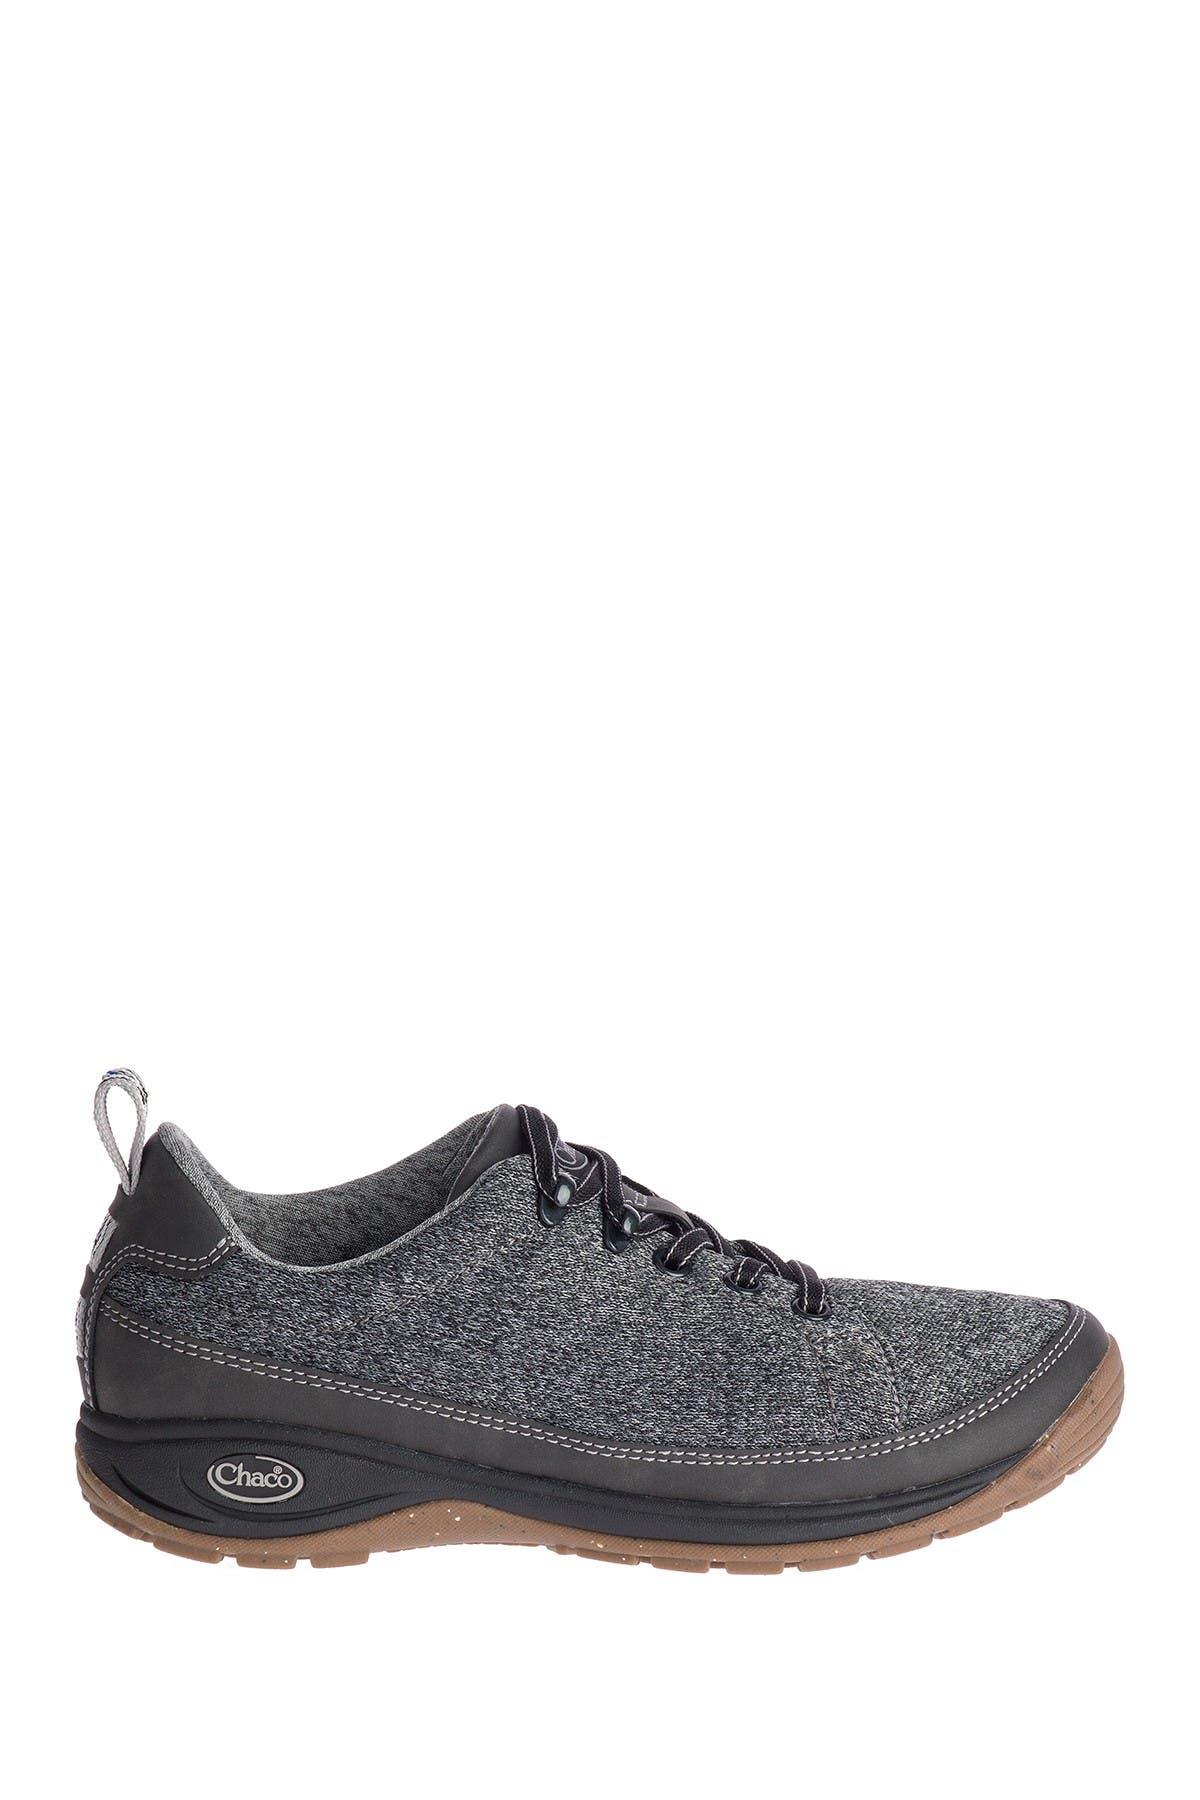 Image of Chaco Kanarra 2.0 Sneaker